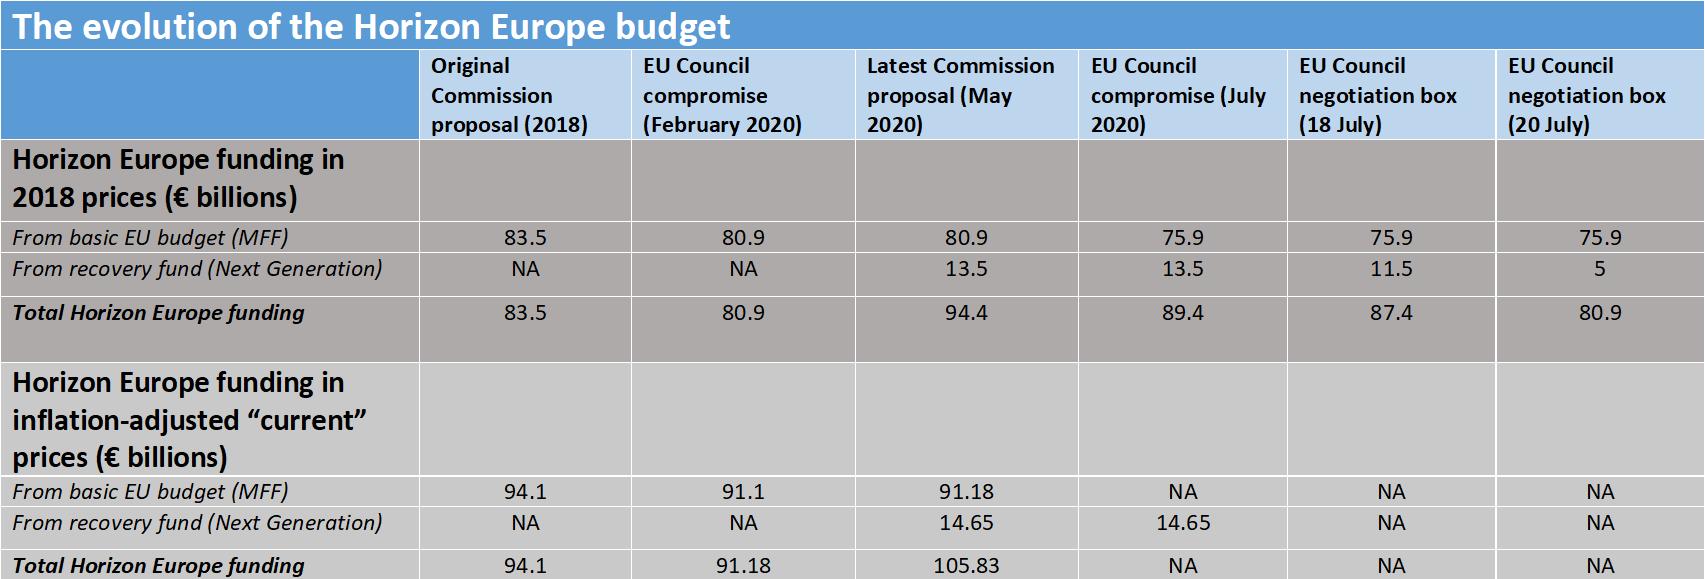 budget-chart-1_0.png